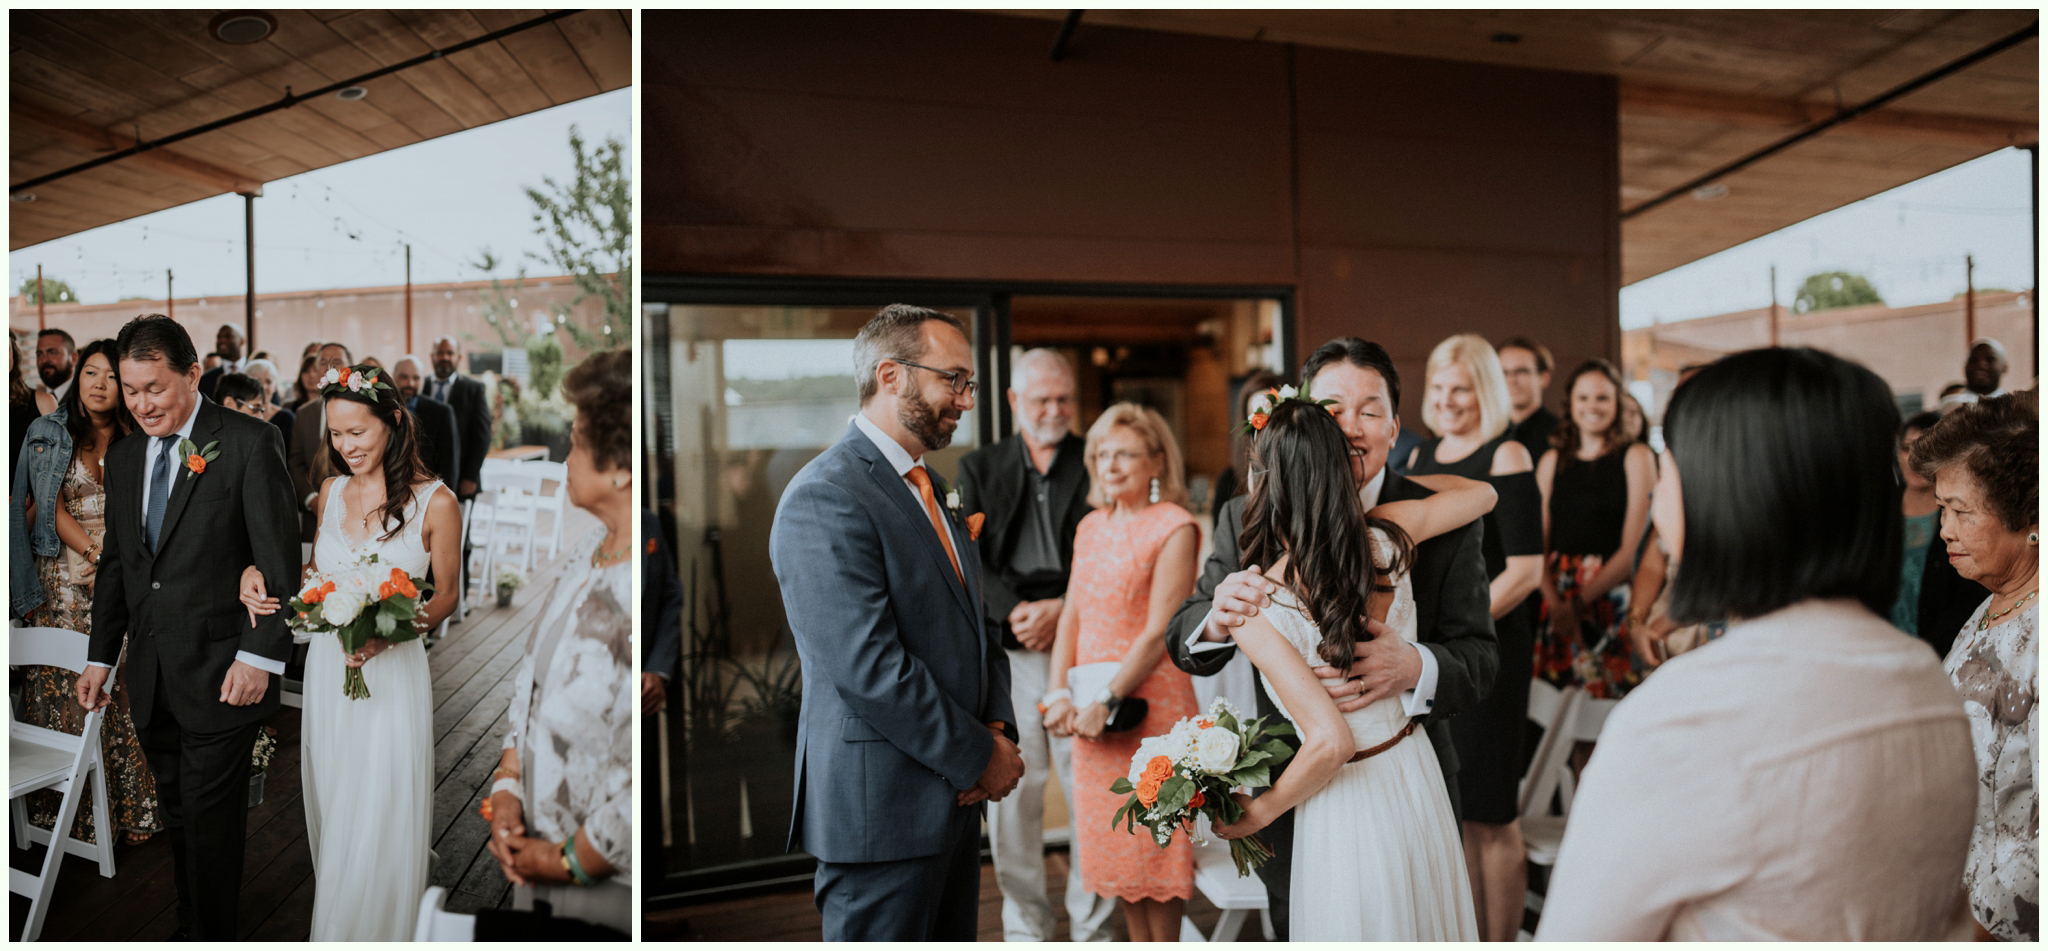 within-sodo-june-wedding-seattle-photographer-caitlyn-nikula-59.jpg